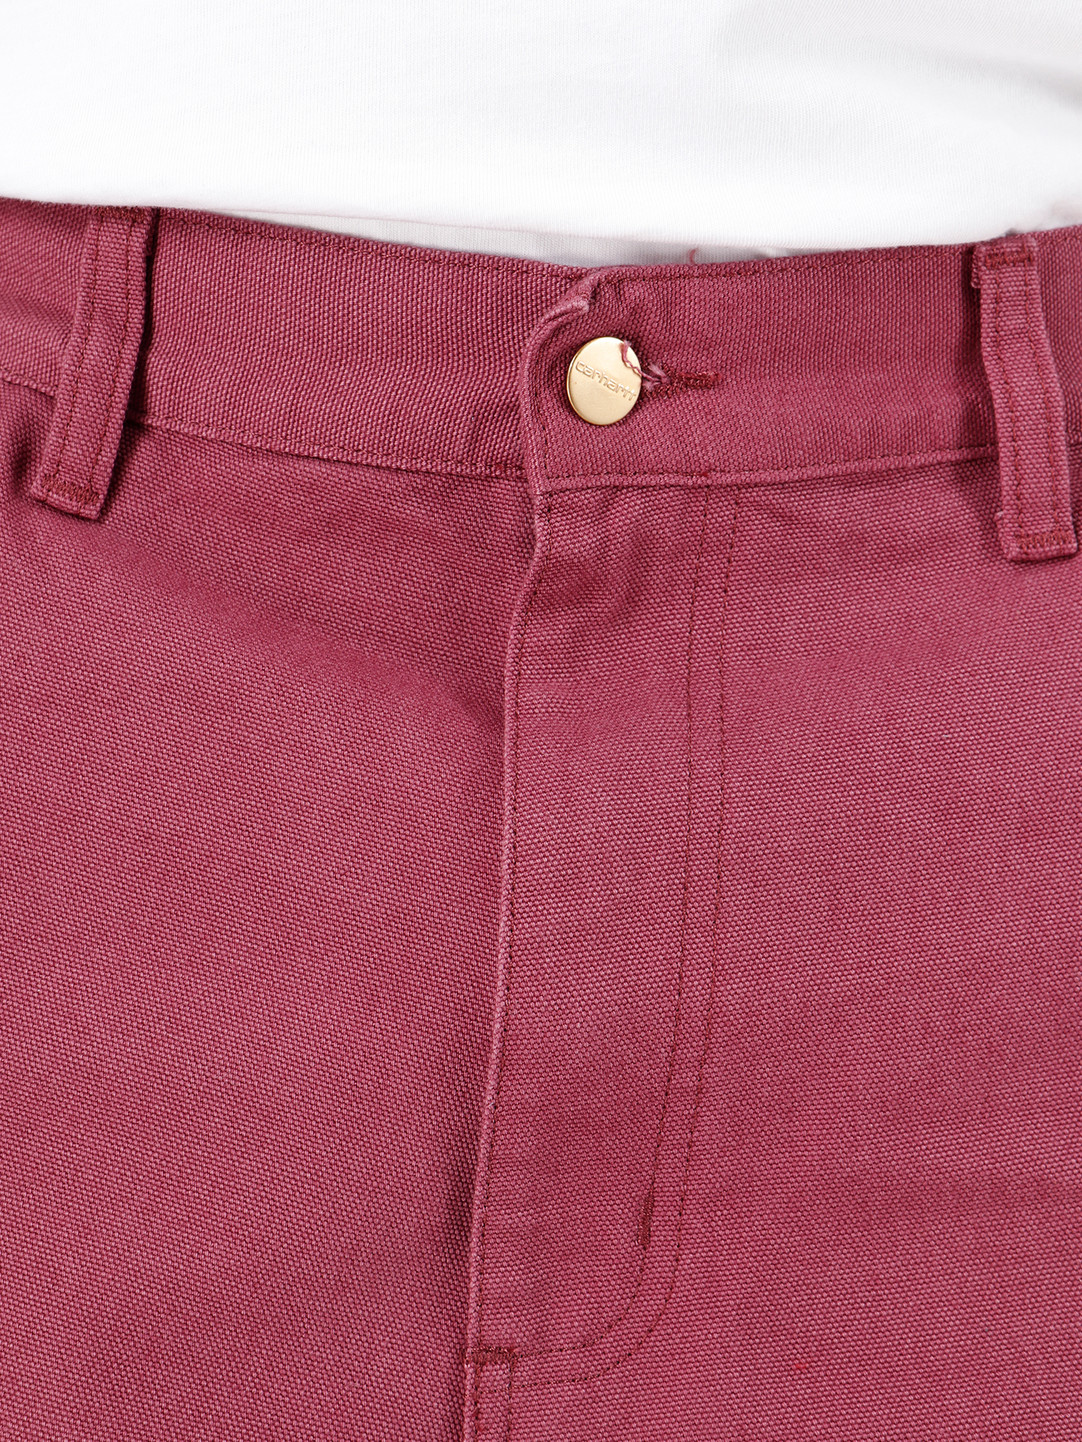 Carhartt WIP Carhartt WIP Double Knee Pant Dusty Fuchsia I026489